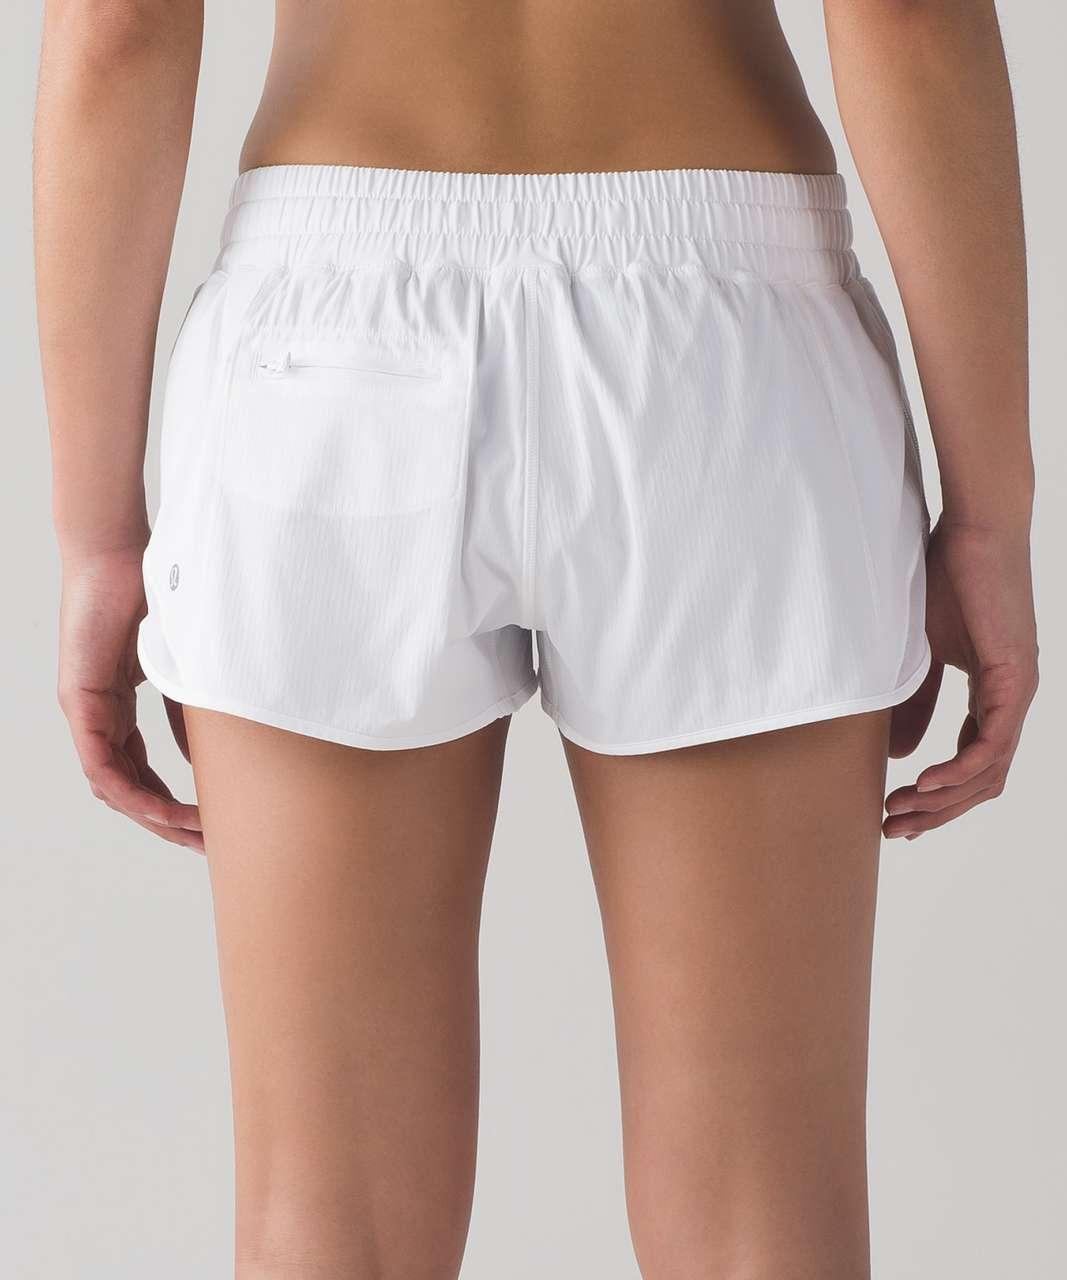 "Lululemon Hotty Hot Short 2.5"" - White"